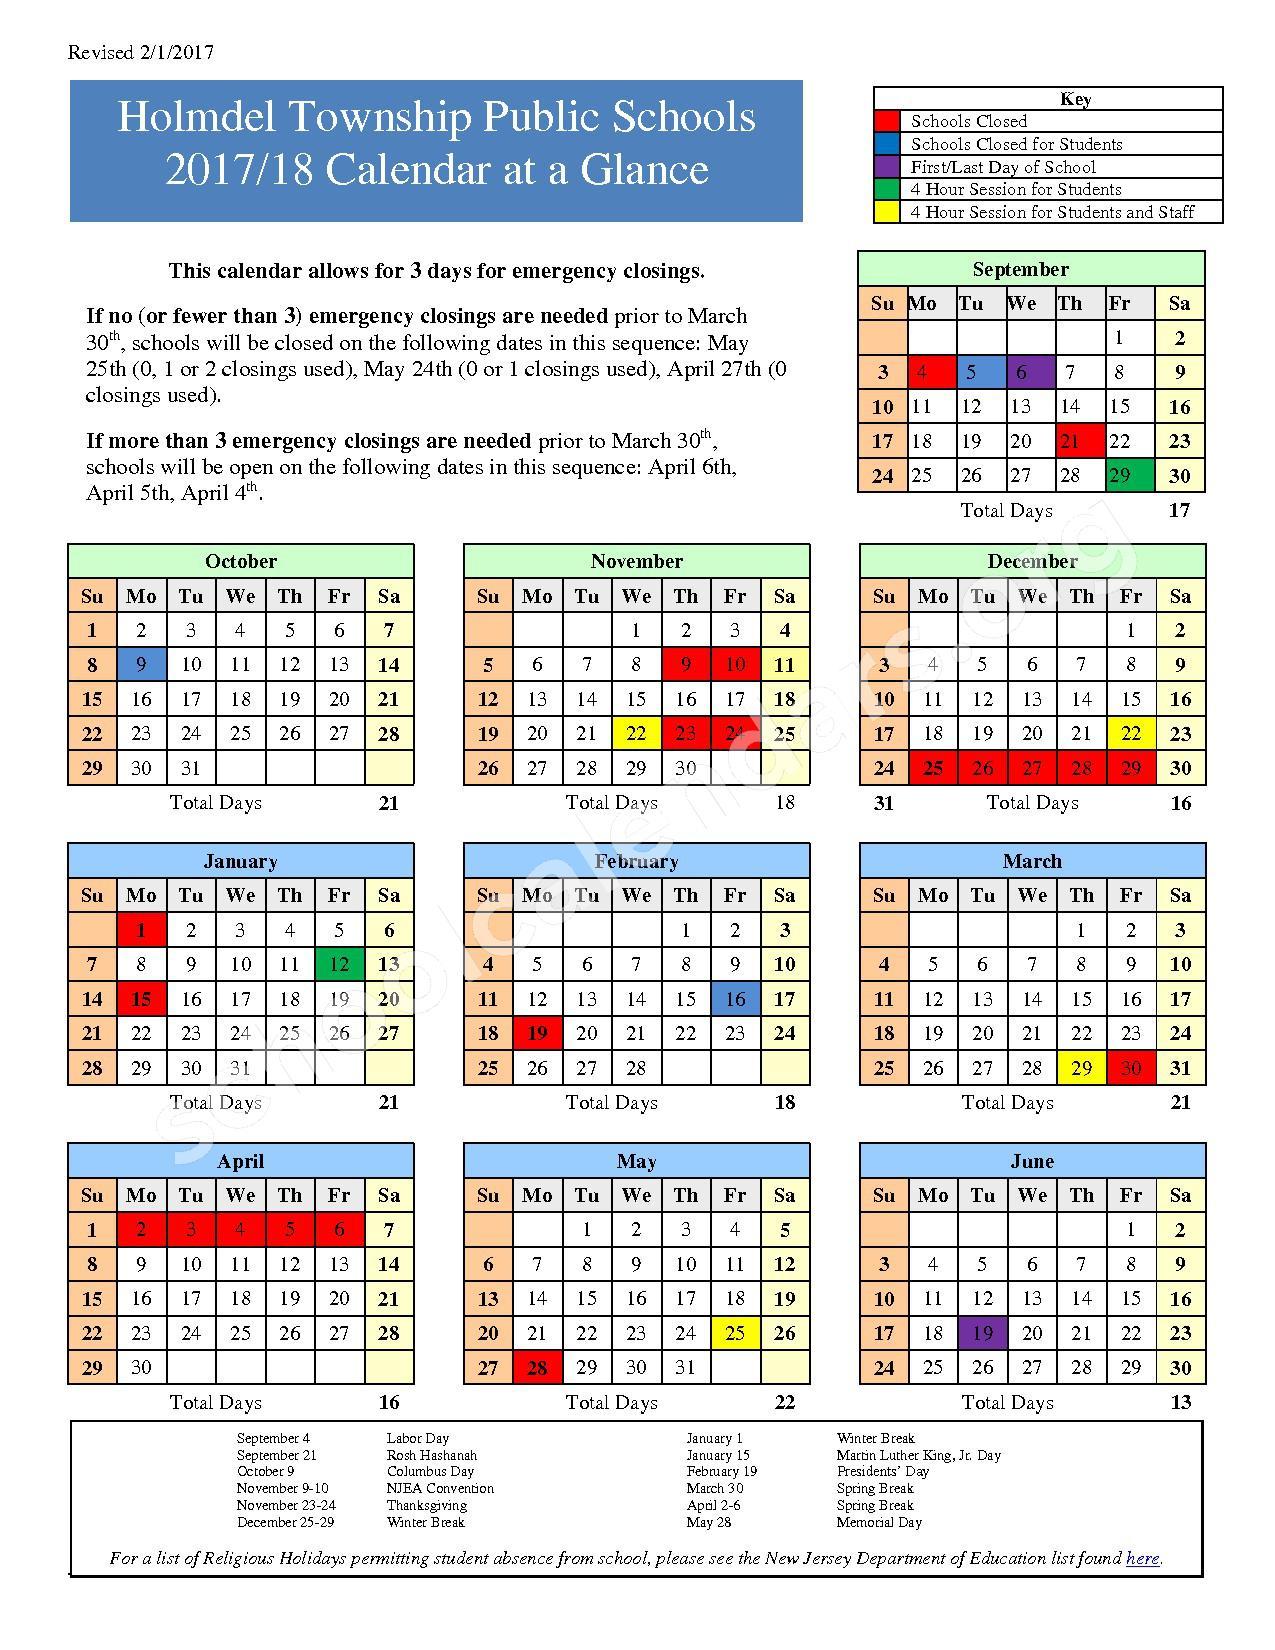 2017 - 2018 District Calendar – Holmdel Township Public Schools – page 1